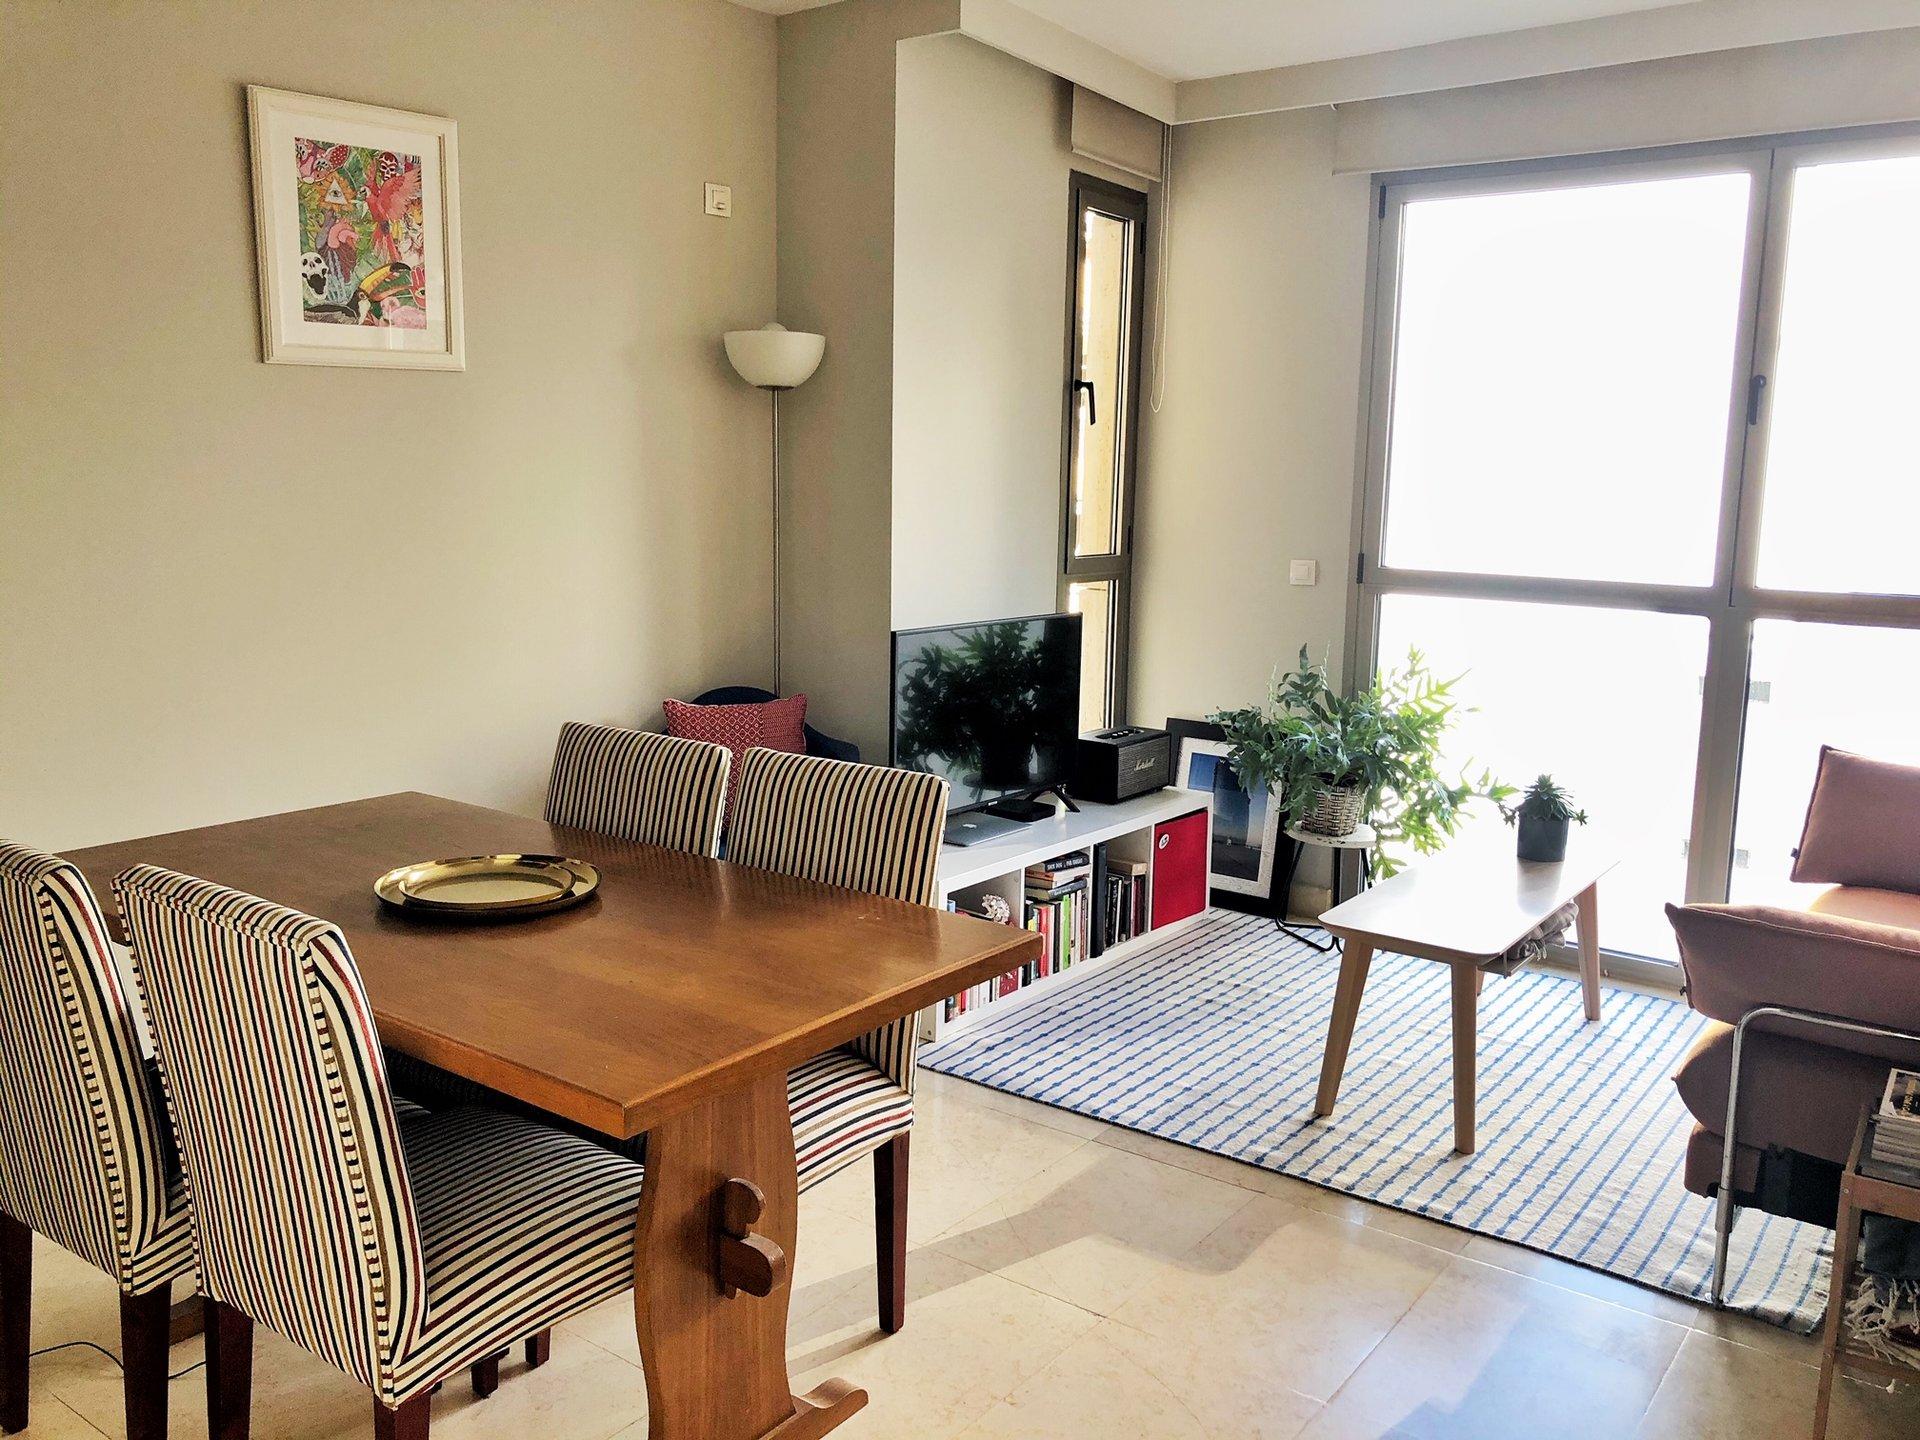 Ad Rental Apartment Madrid Trafalgar (28010) ref:L0360MAC